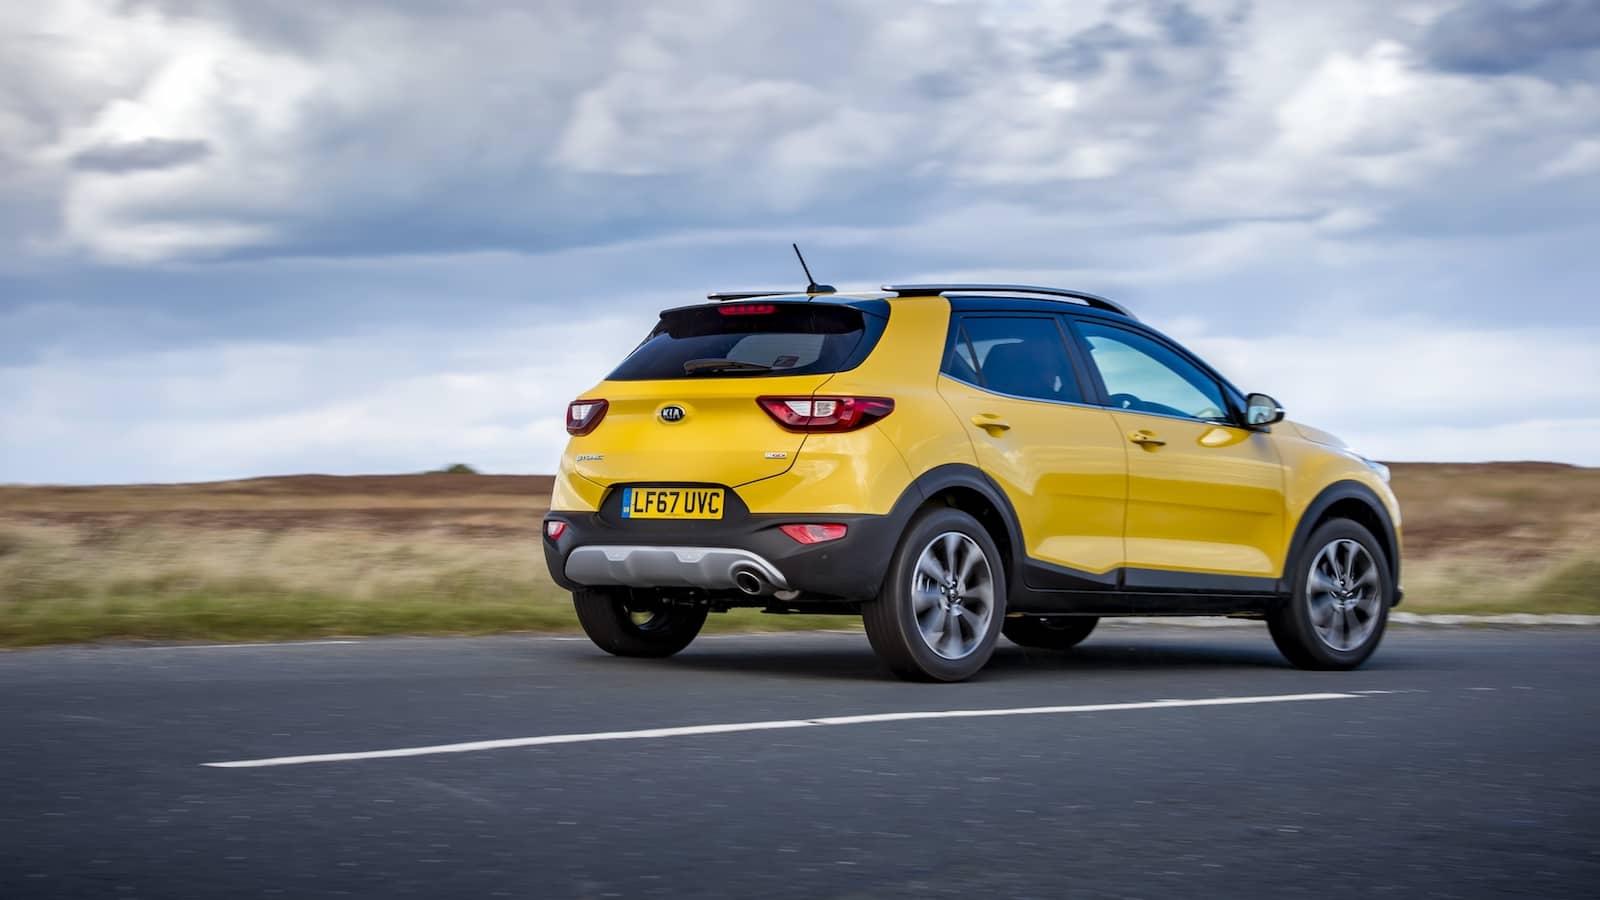 Kia Stonic rear (2017 - present) | The Car Expert